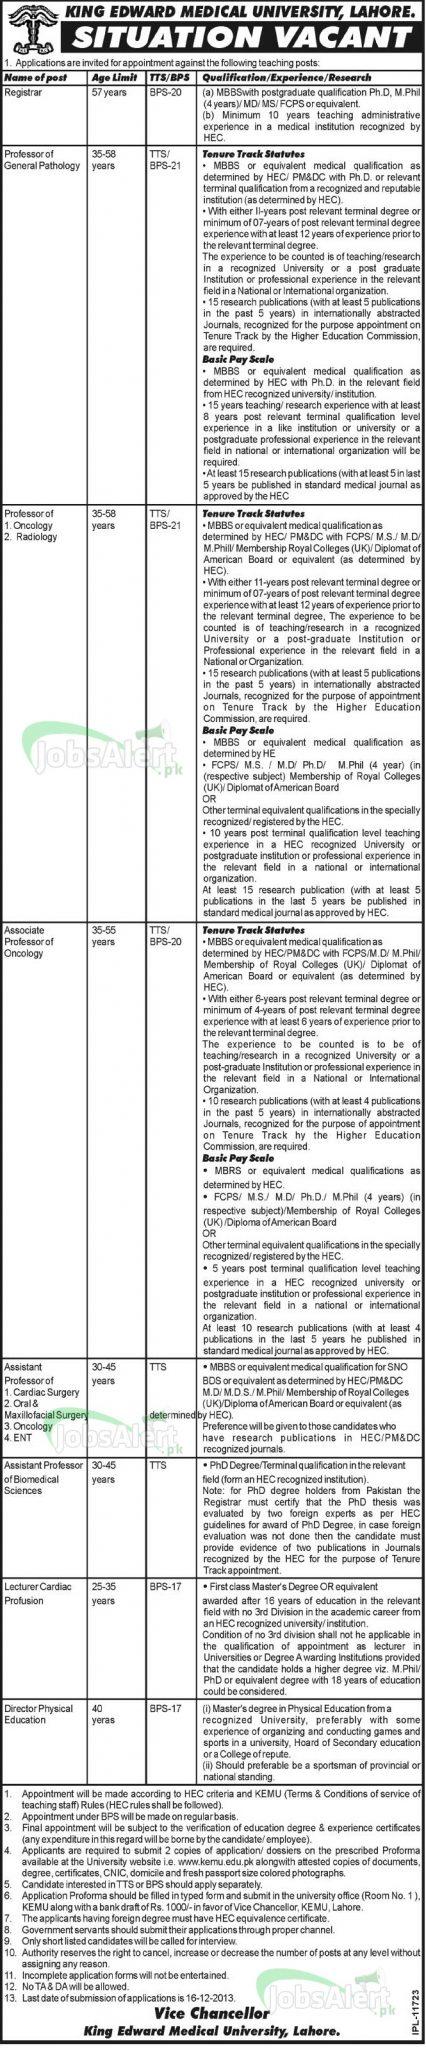 Registrar & Professor Jobs in King Edward Medical University Lahore